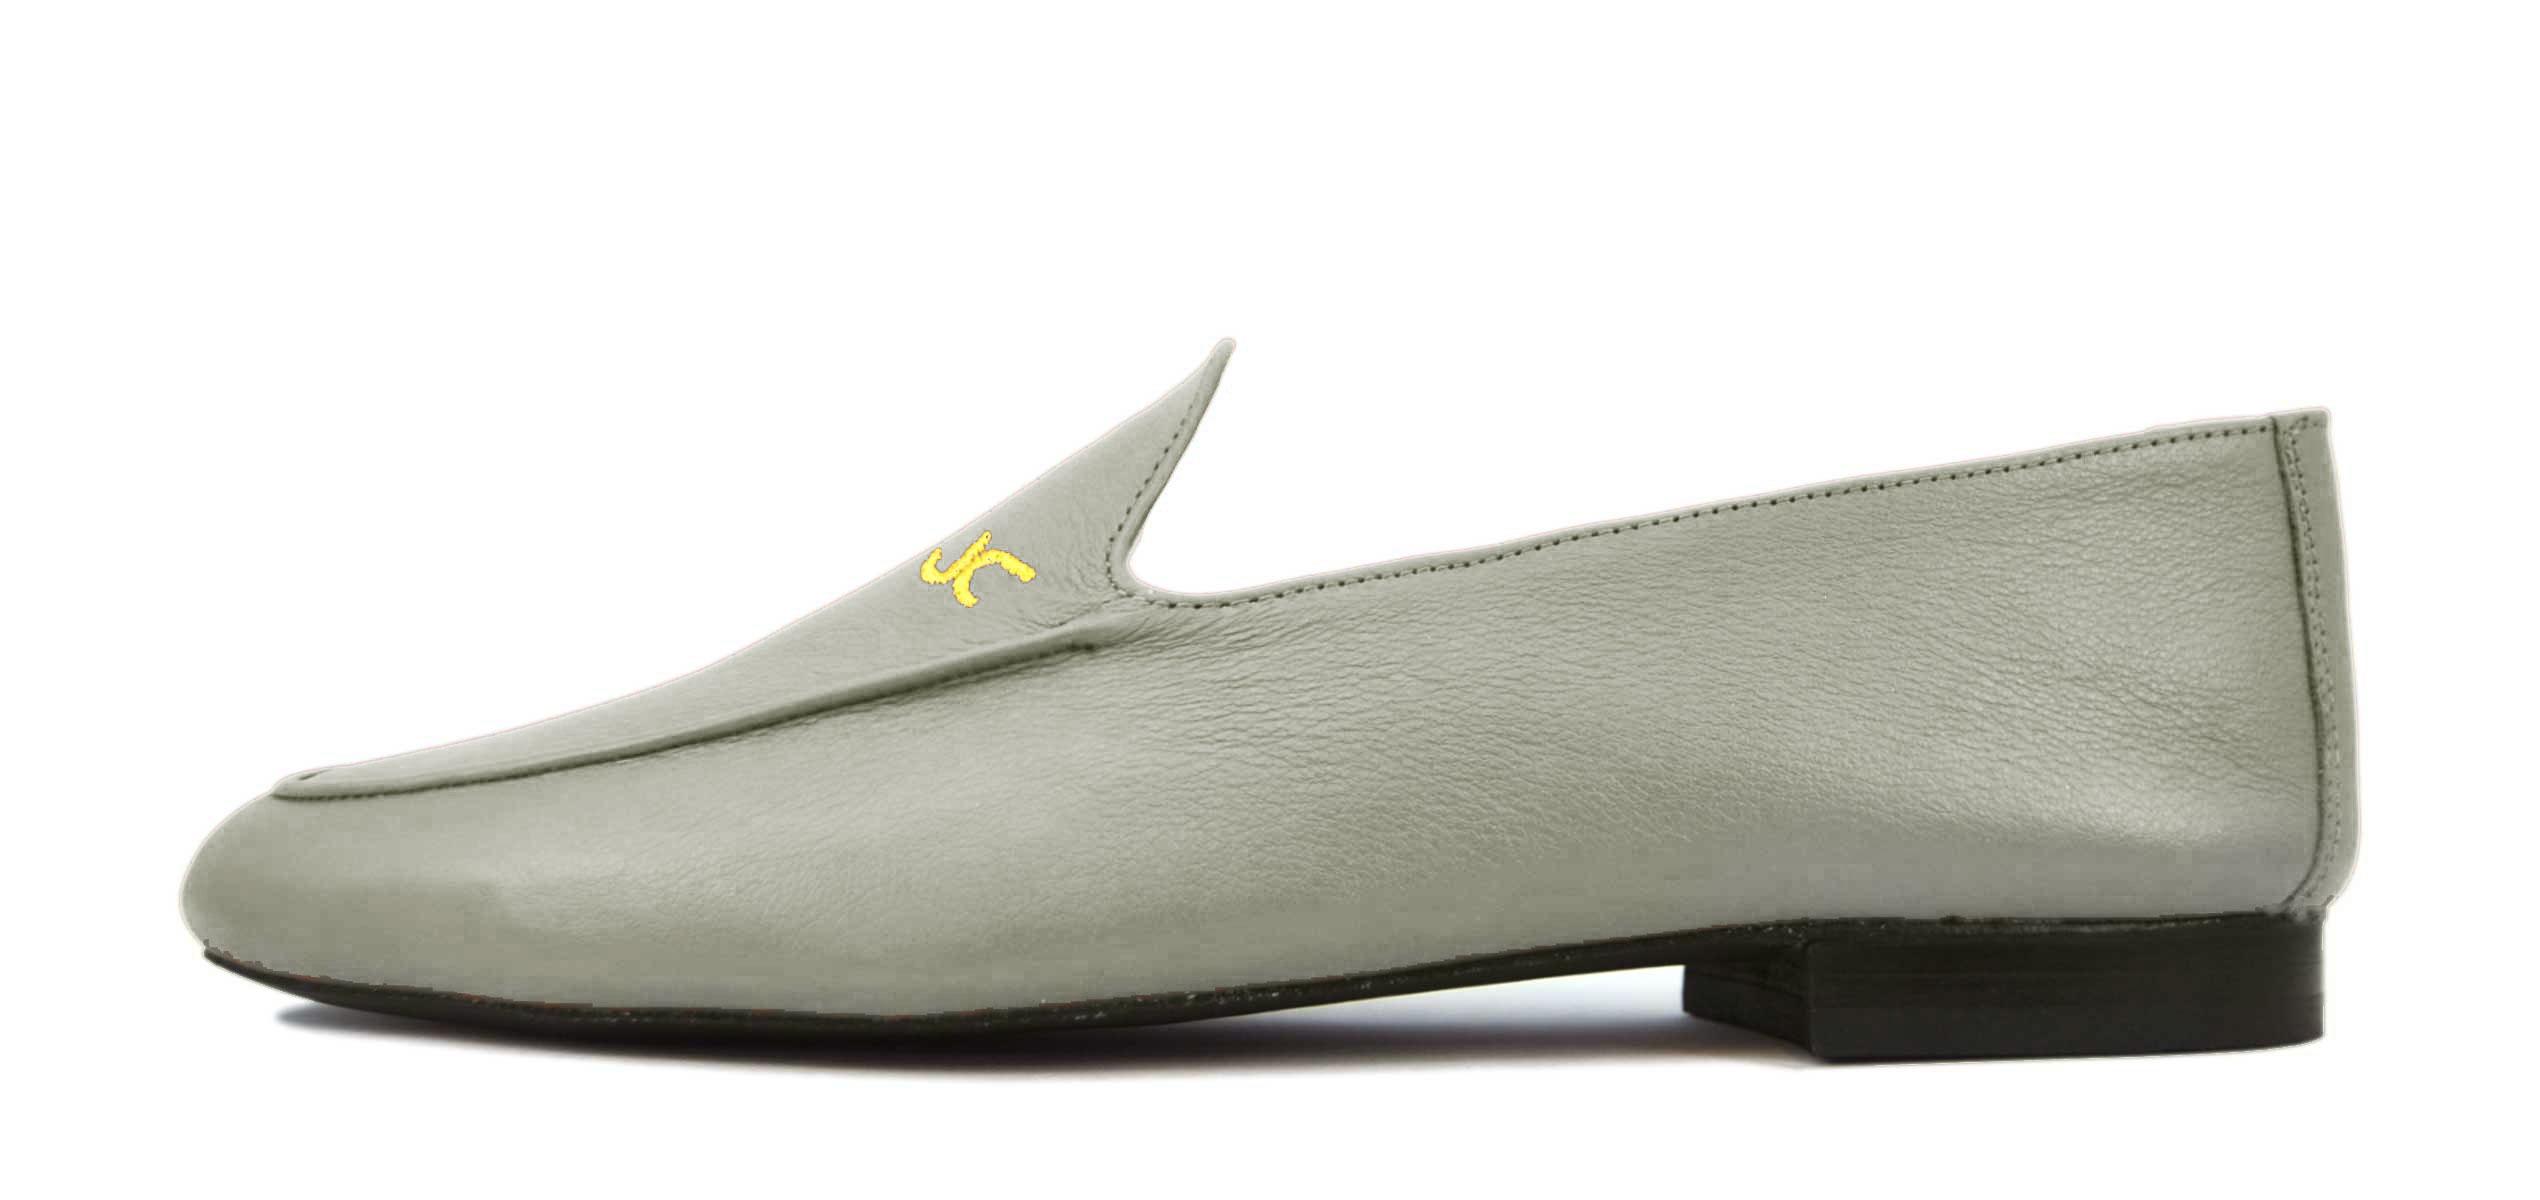 Foto 1 de Zapatos Julio Iglesias 528 JC Perla Napa Mocasin